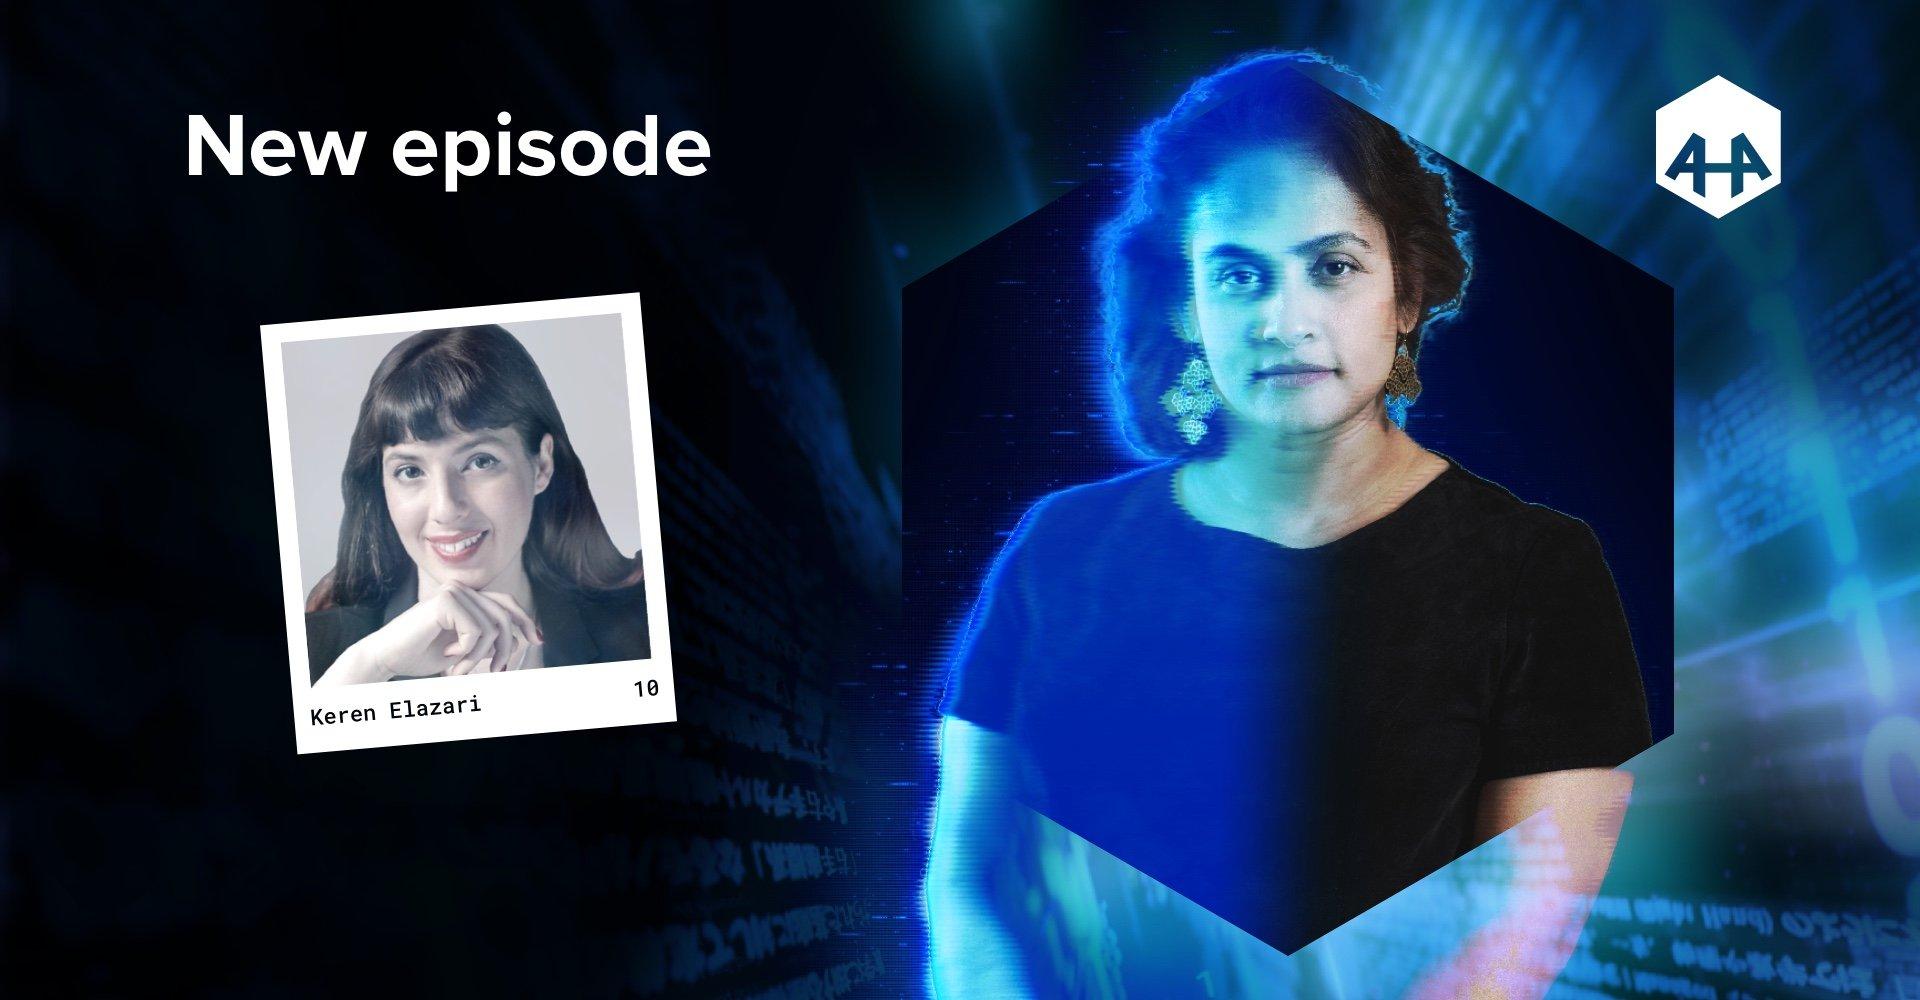 Avast Hacker Archives Episode 10 – Keren Elazari | Avast